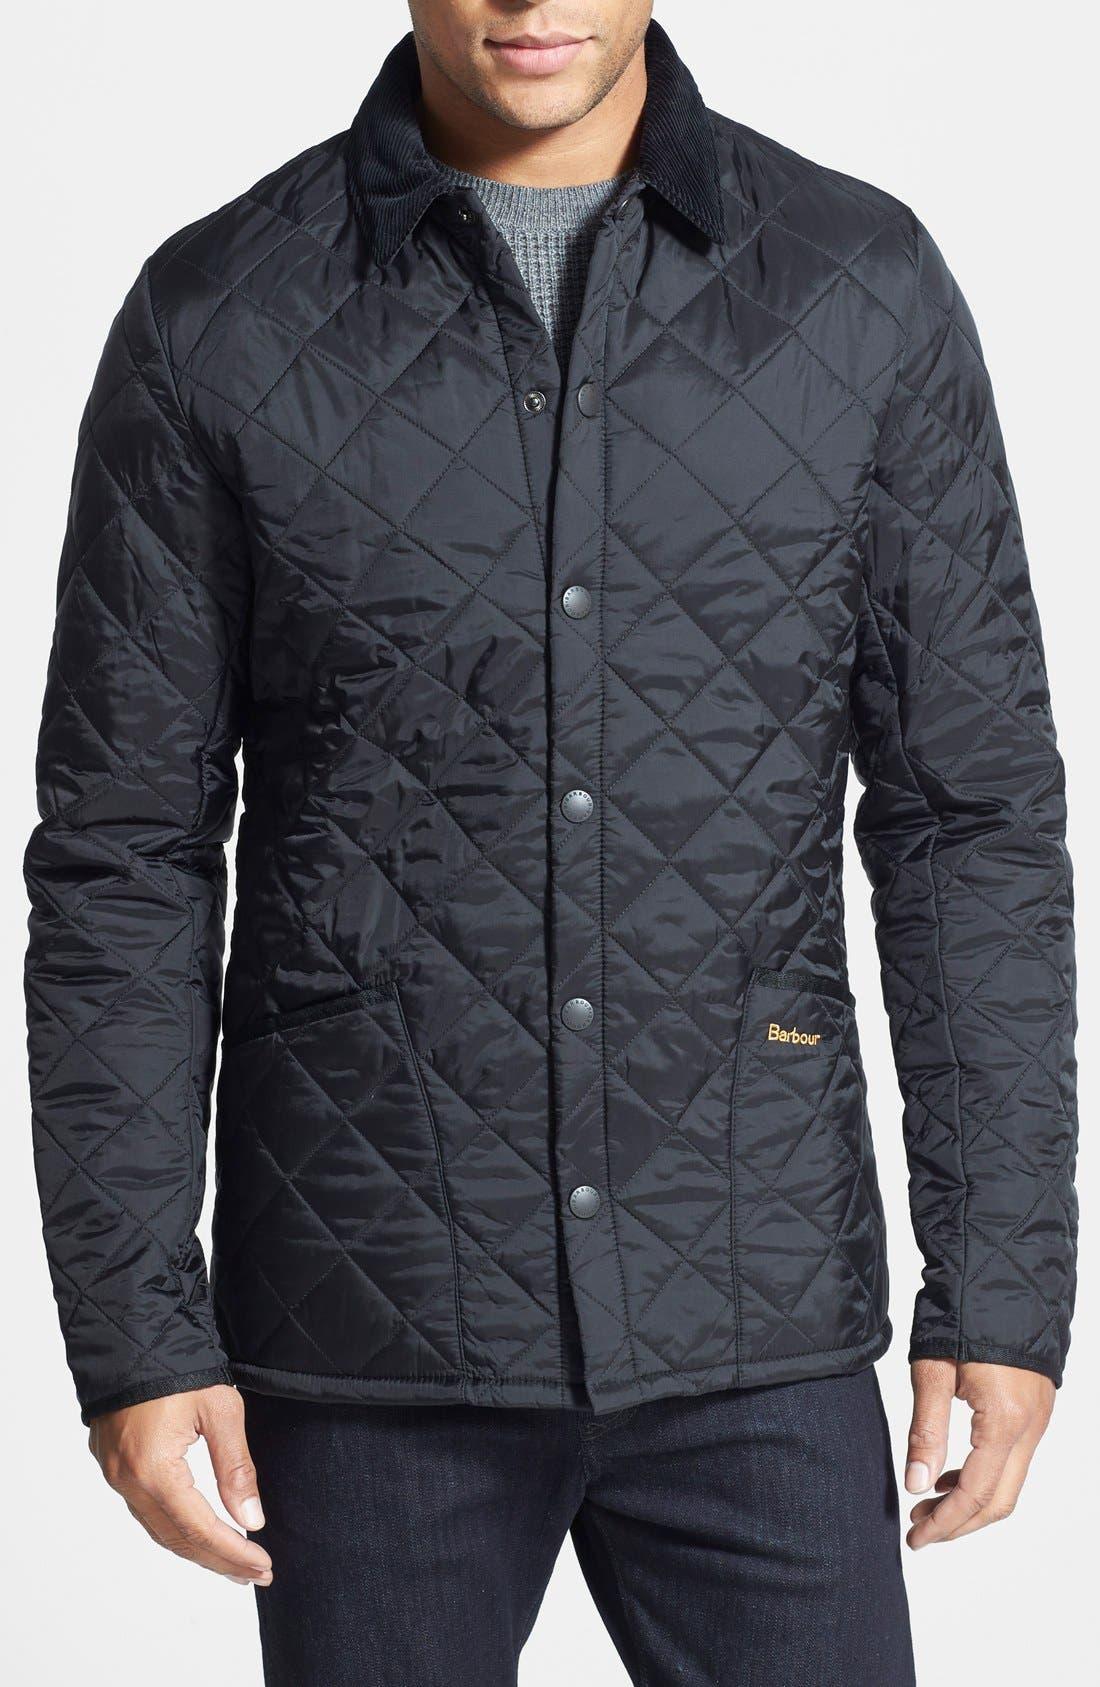 Black barbour jacket sale